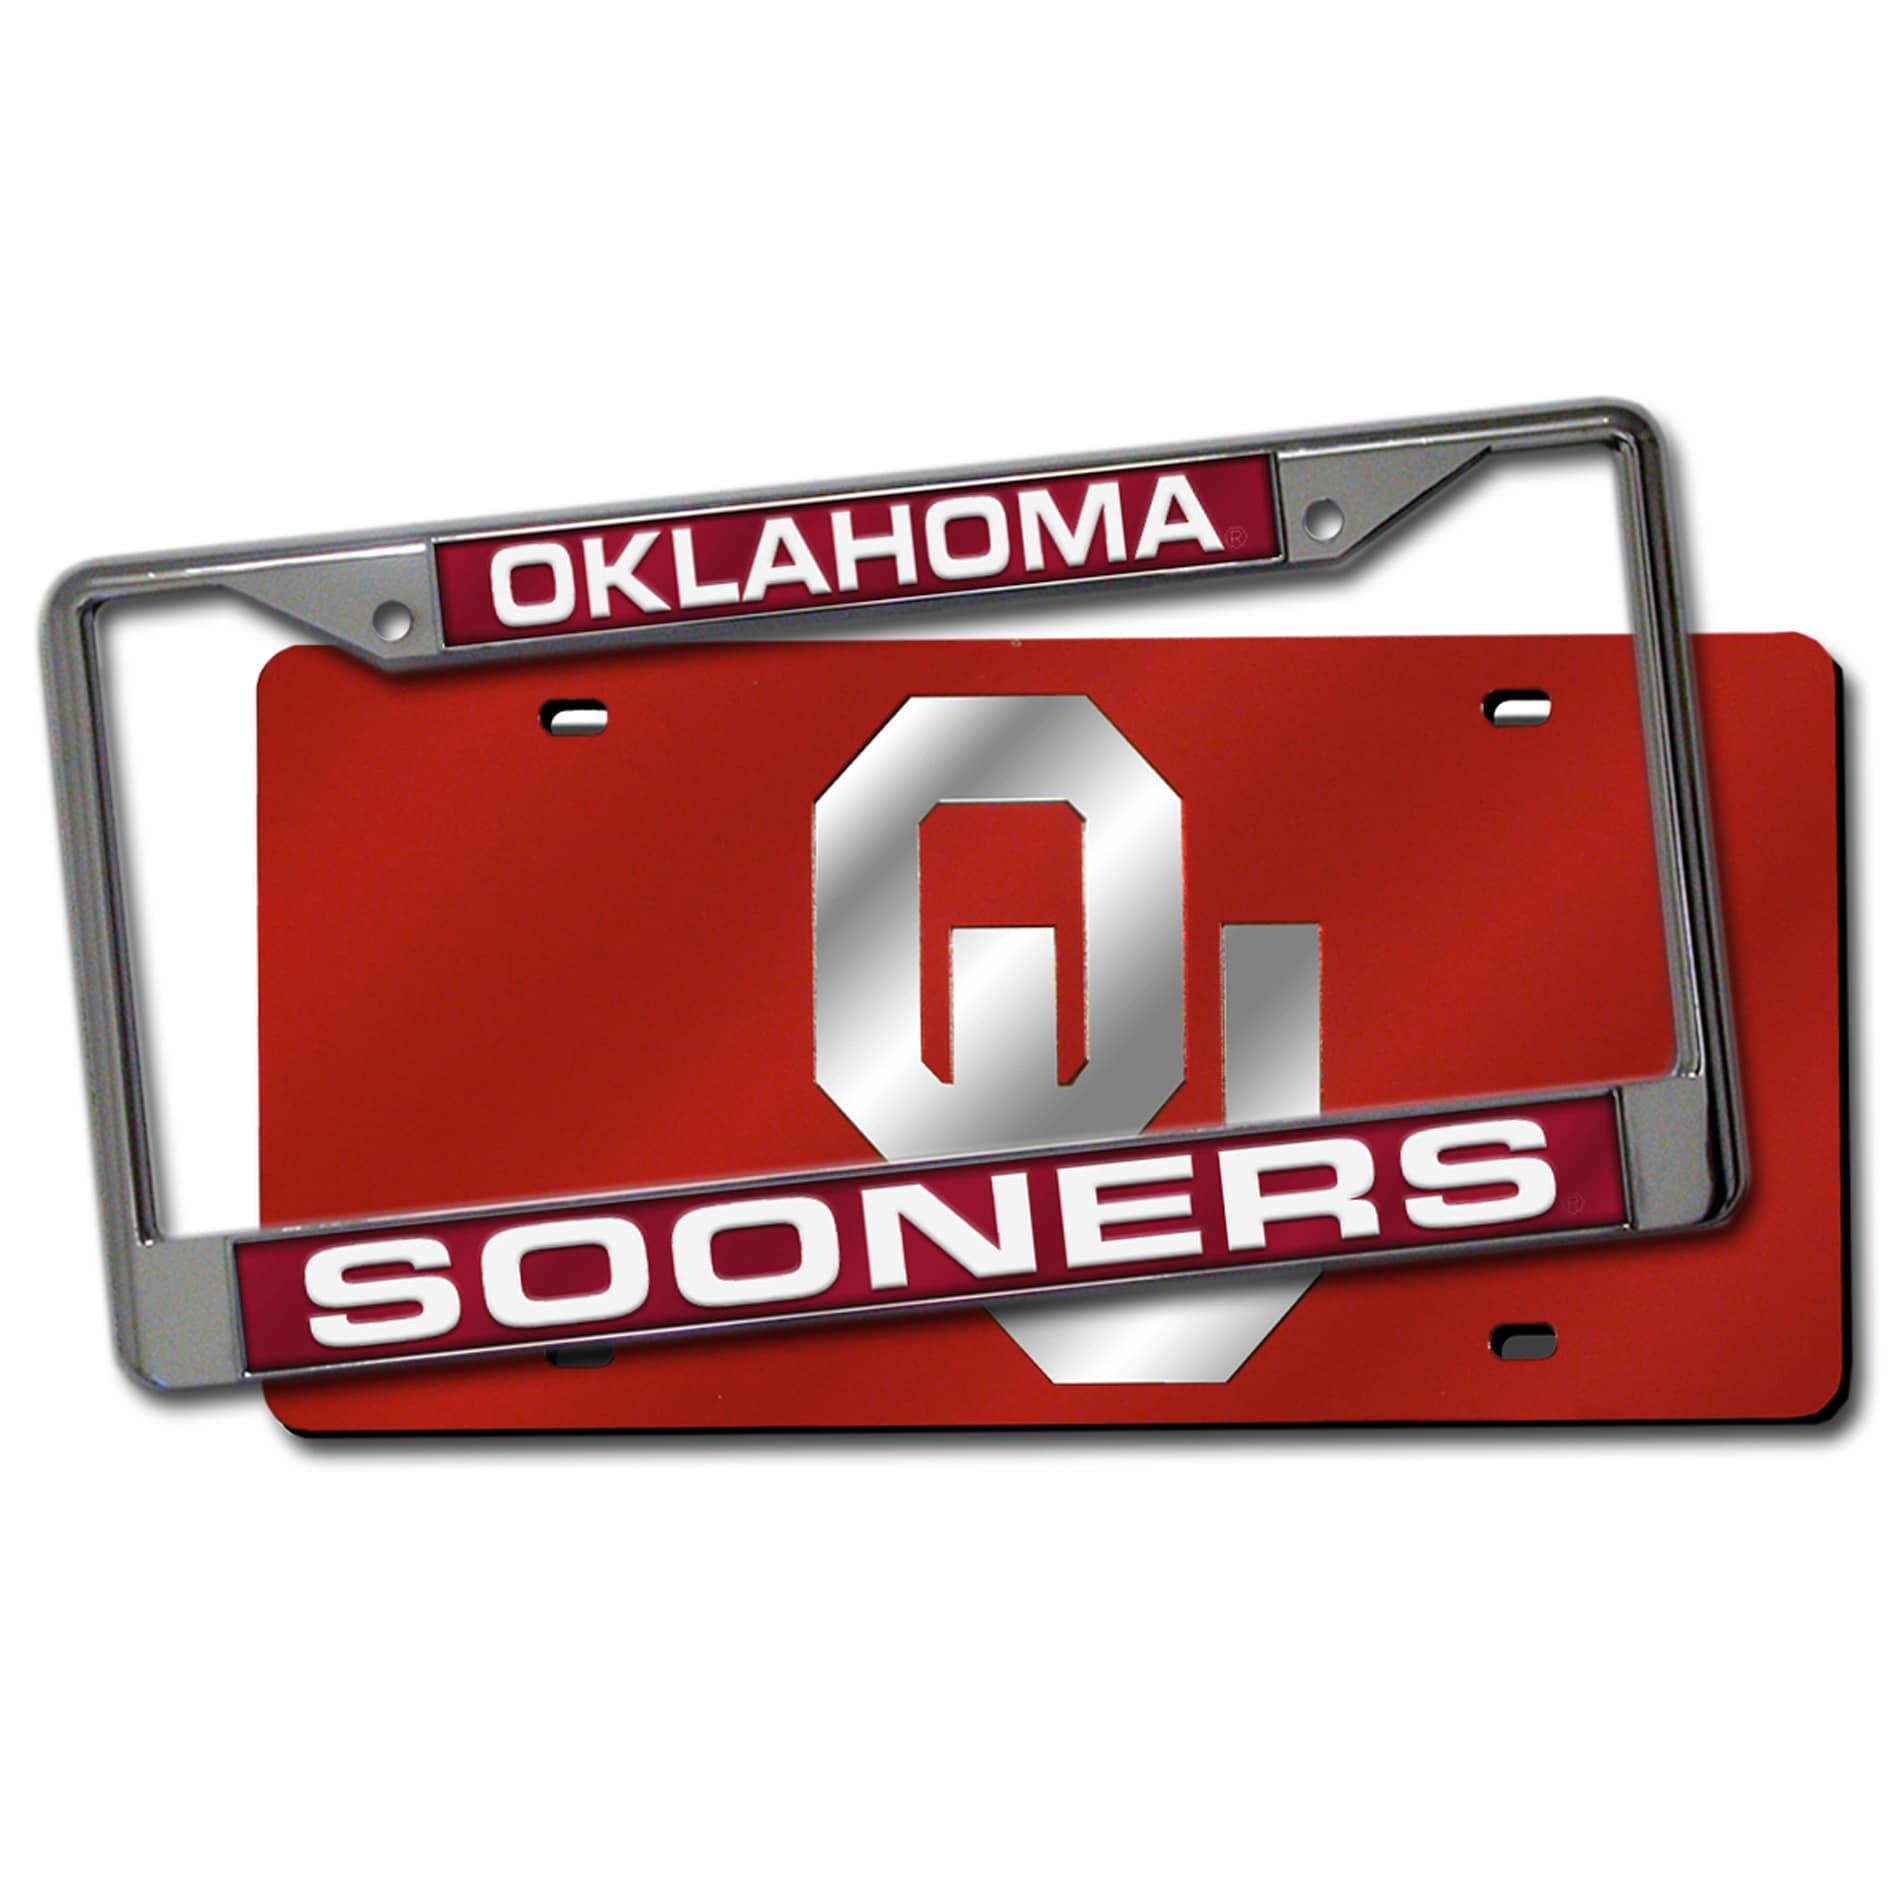 Oklahoma Sooners Laser Cut License Plate Pack